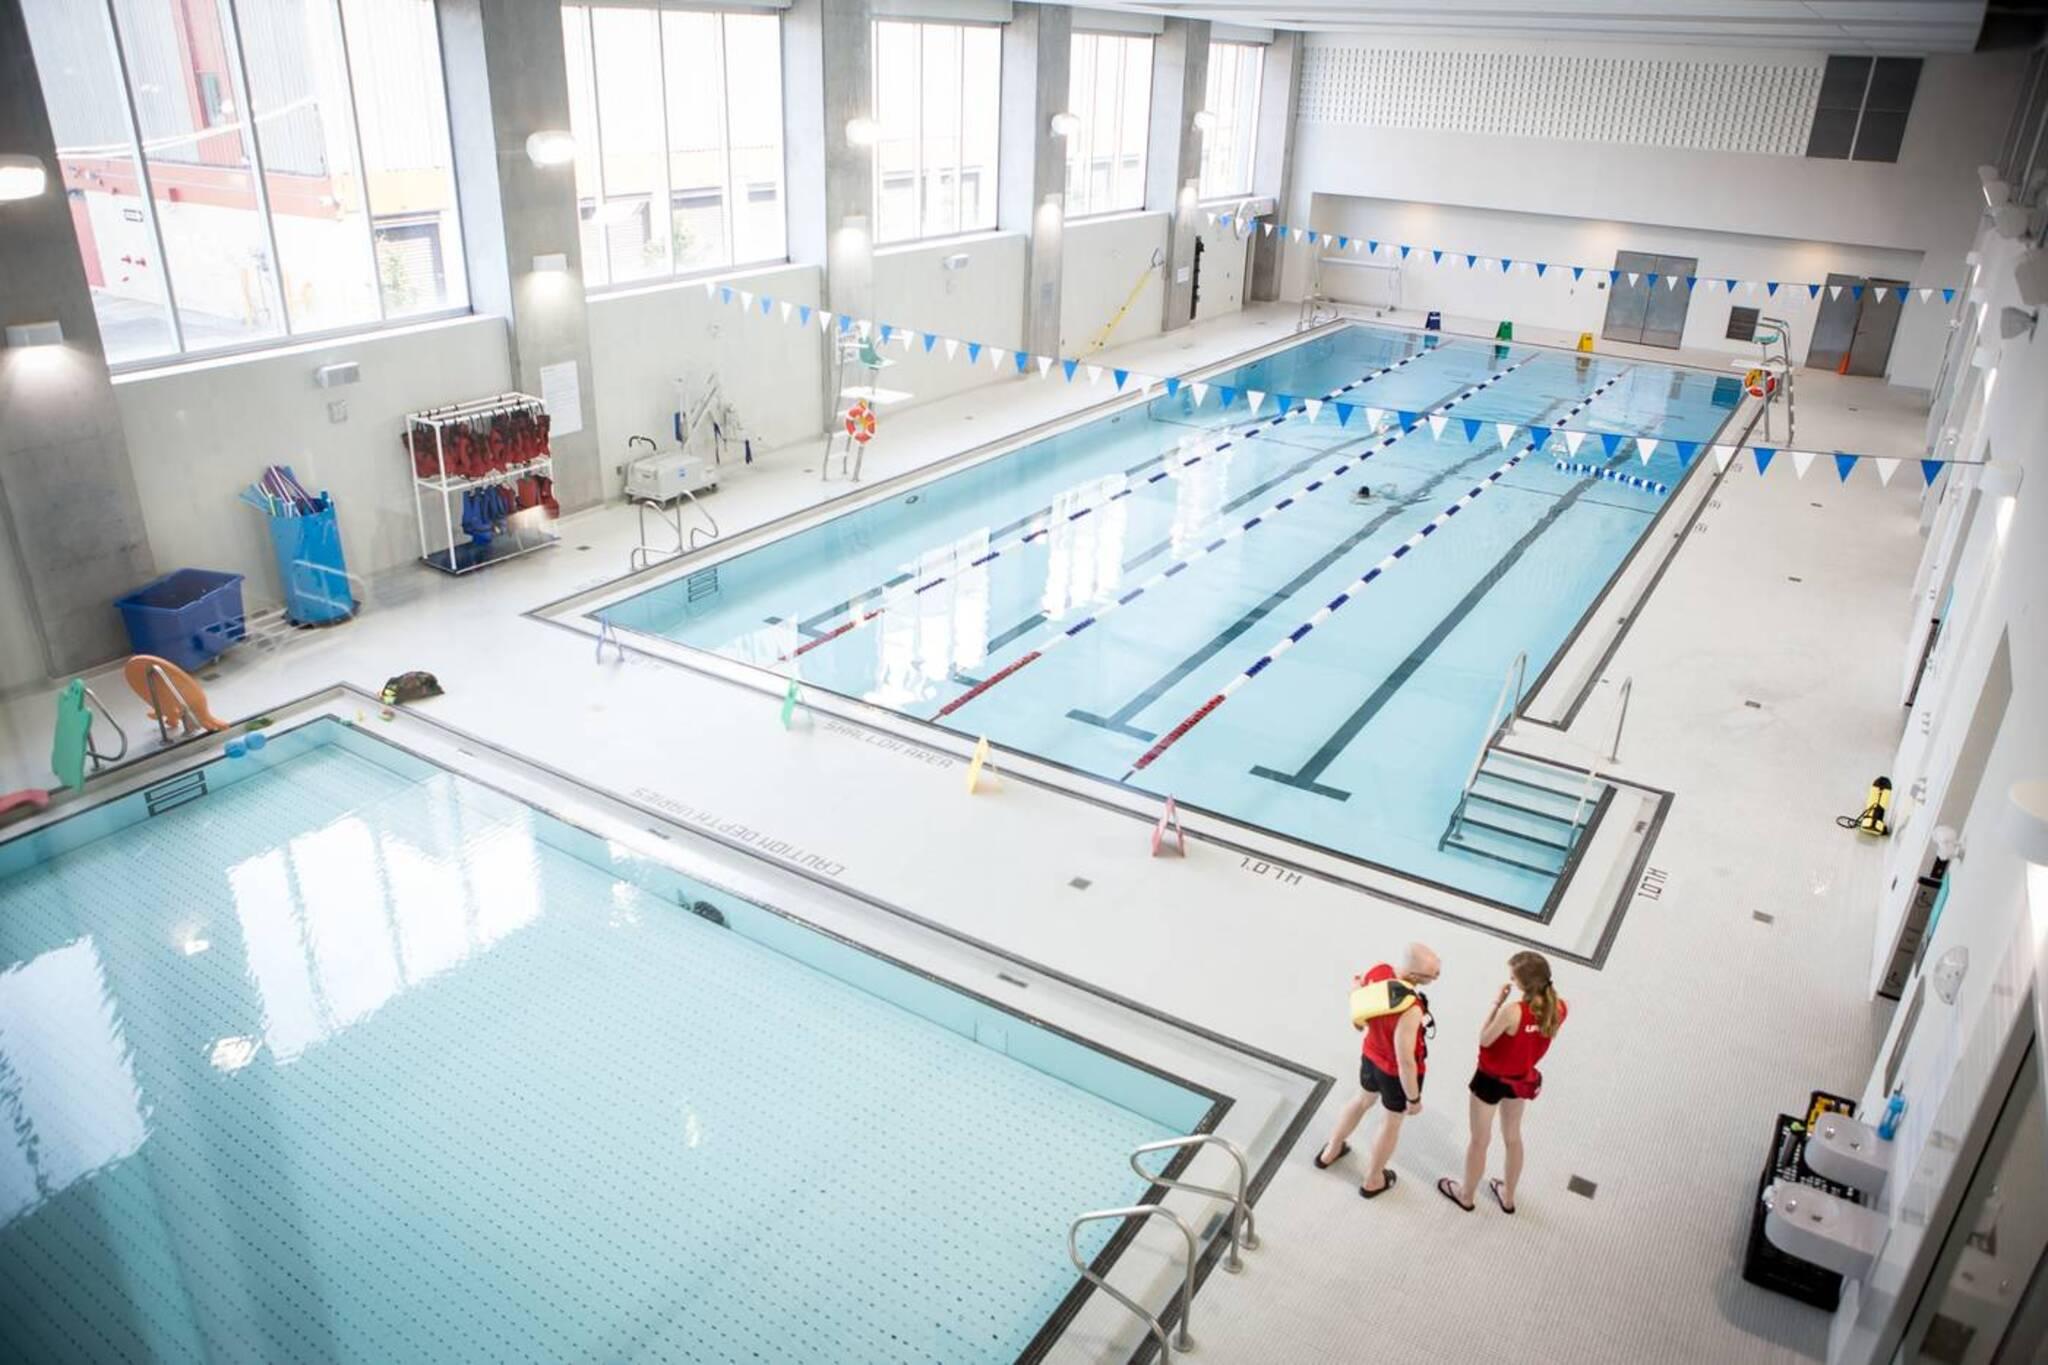 The top 15 indoor swimming pools in Toronto